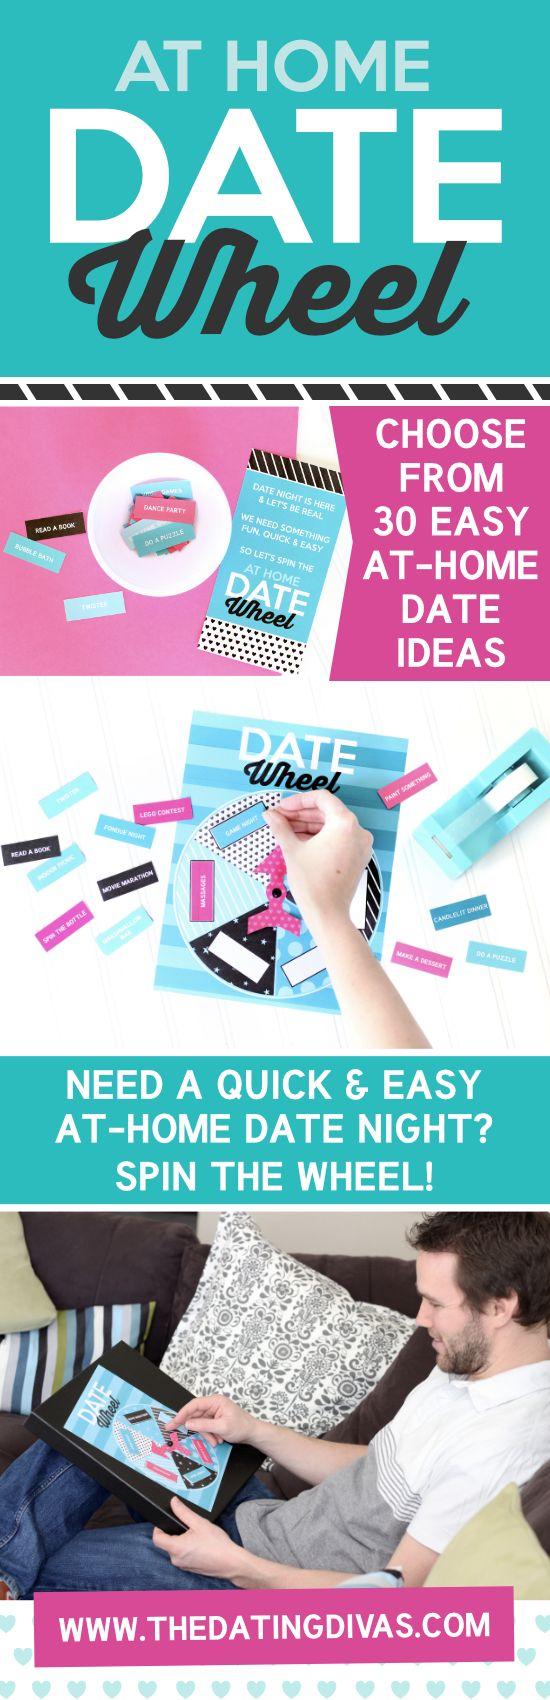 Dating divas 45 date night ideas